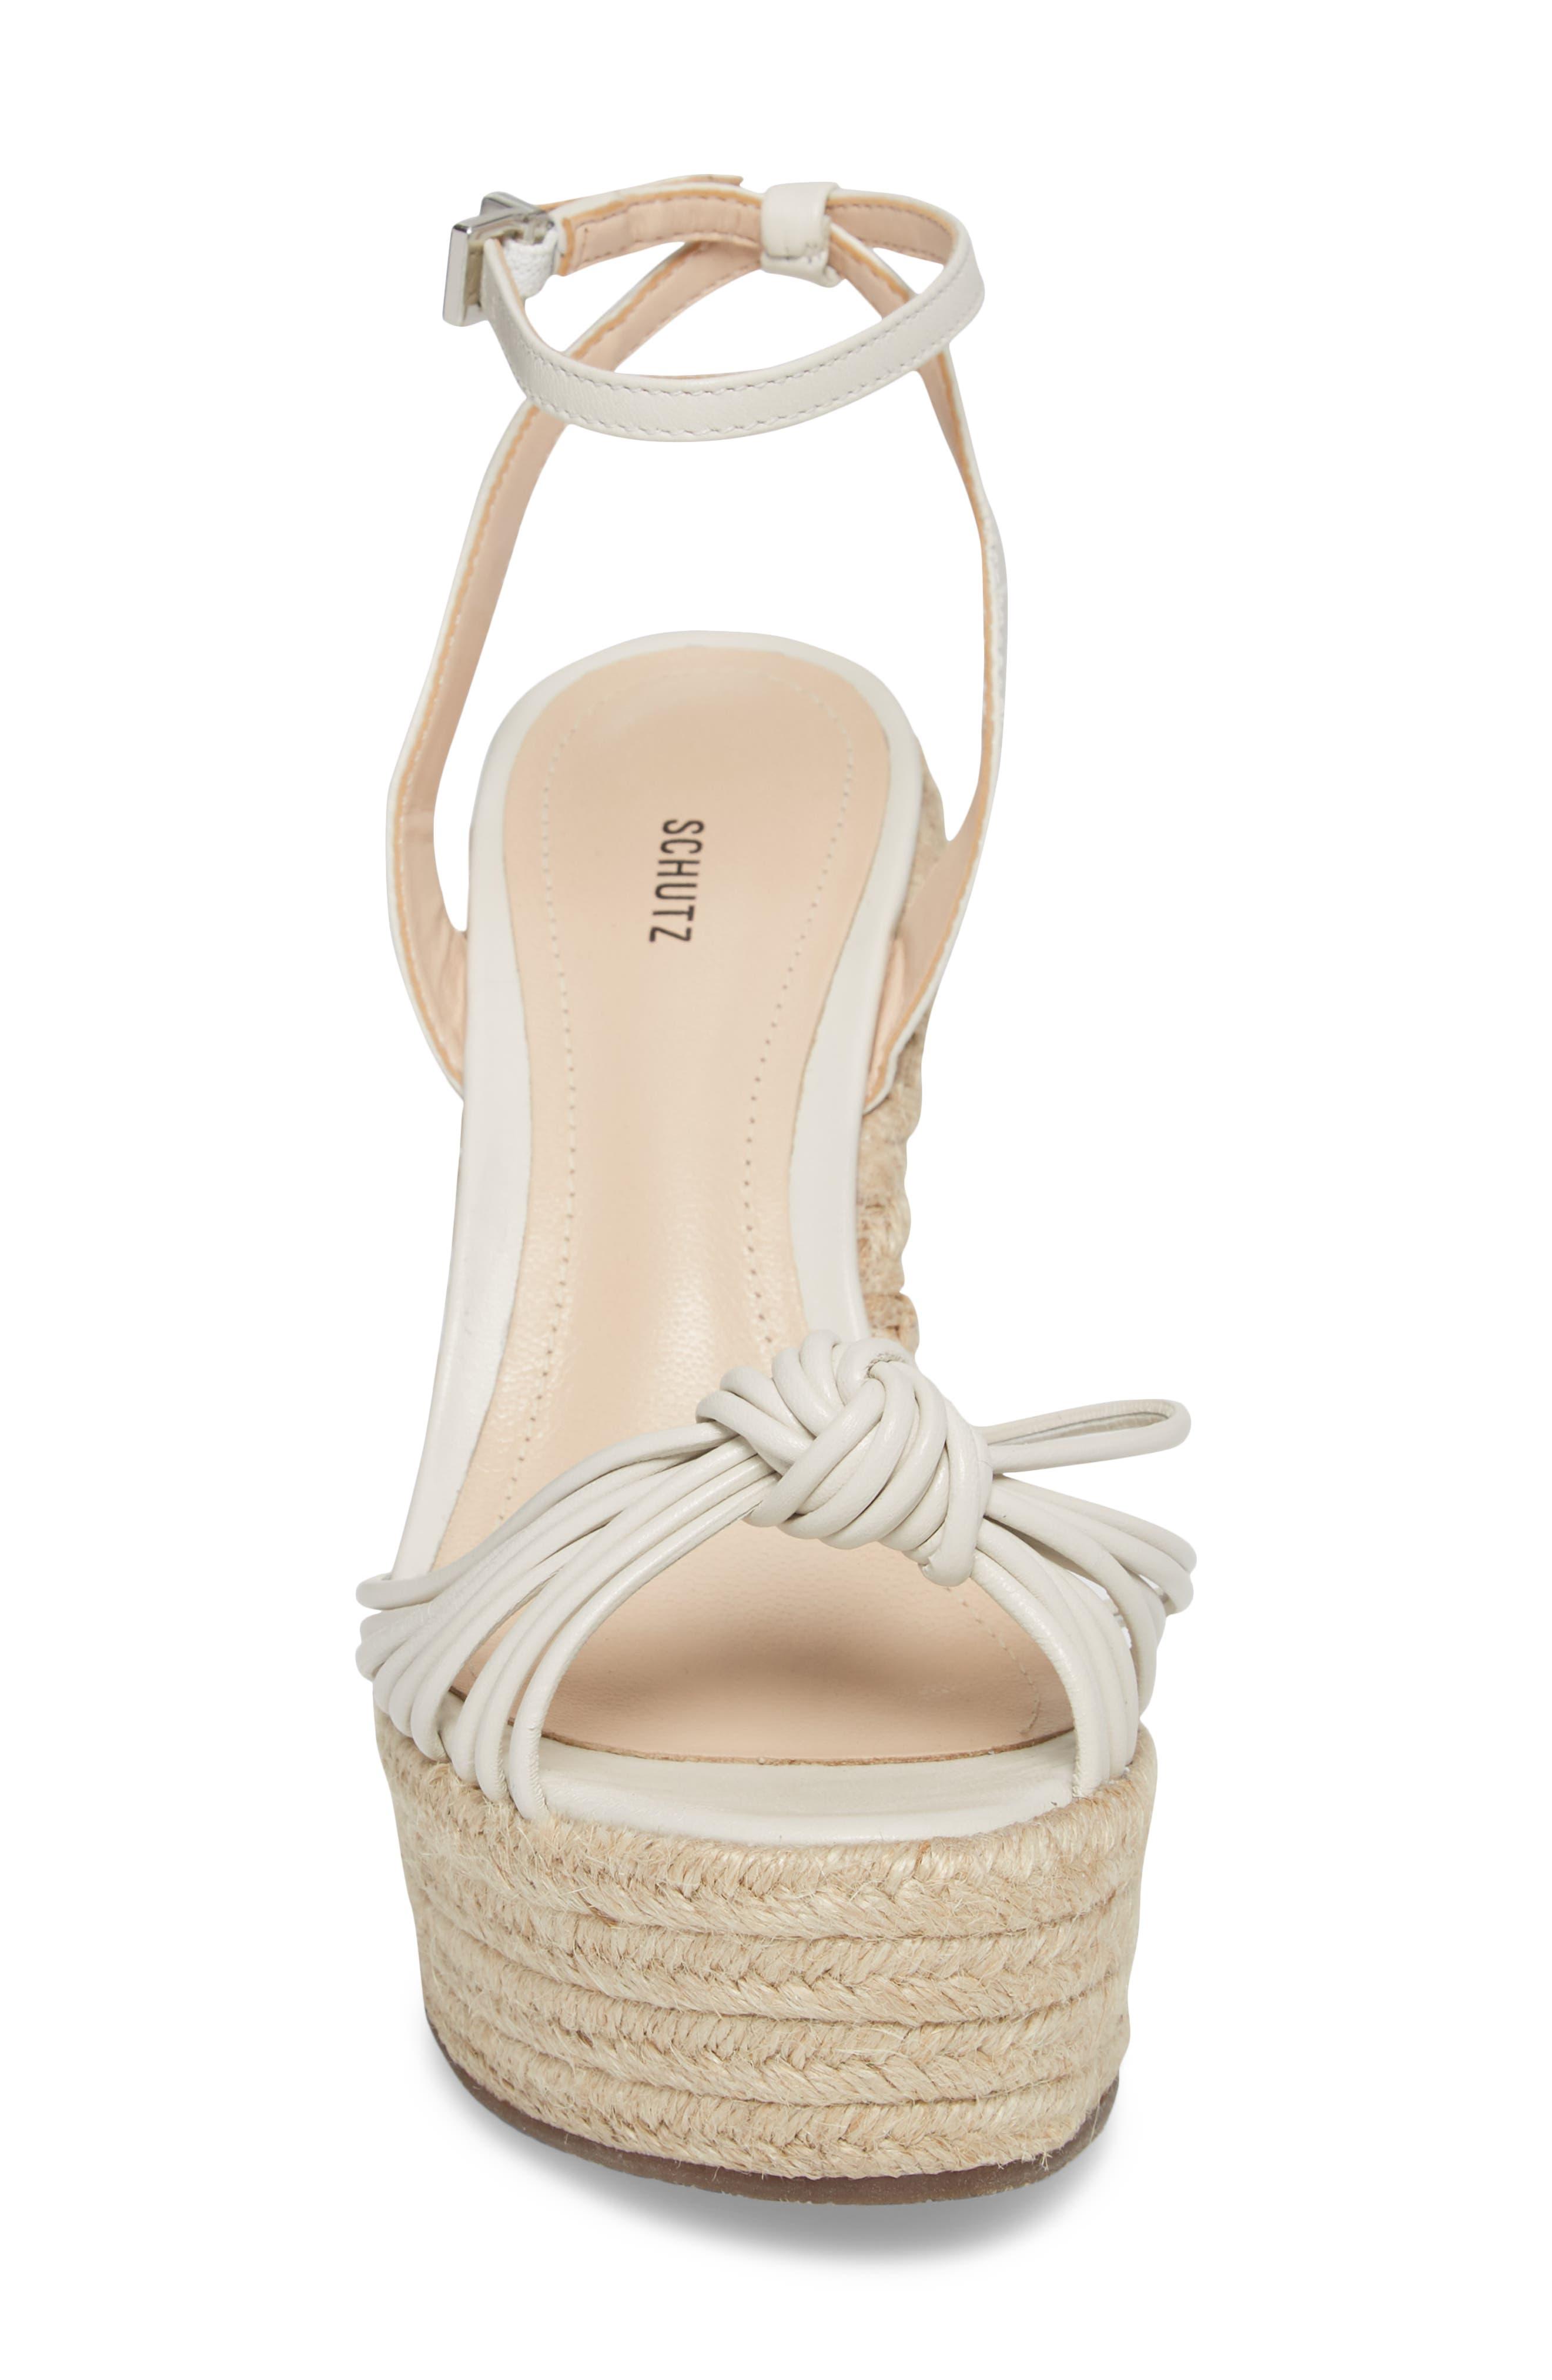 Gianne Platform Wedge Sandal,                             Alternate thumbnail 4, color,                             PEARL FABRIC